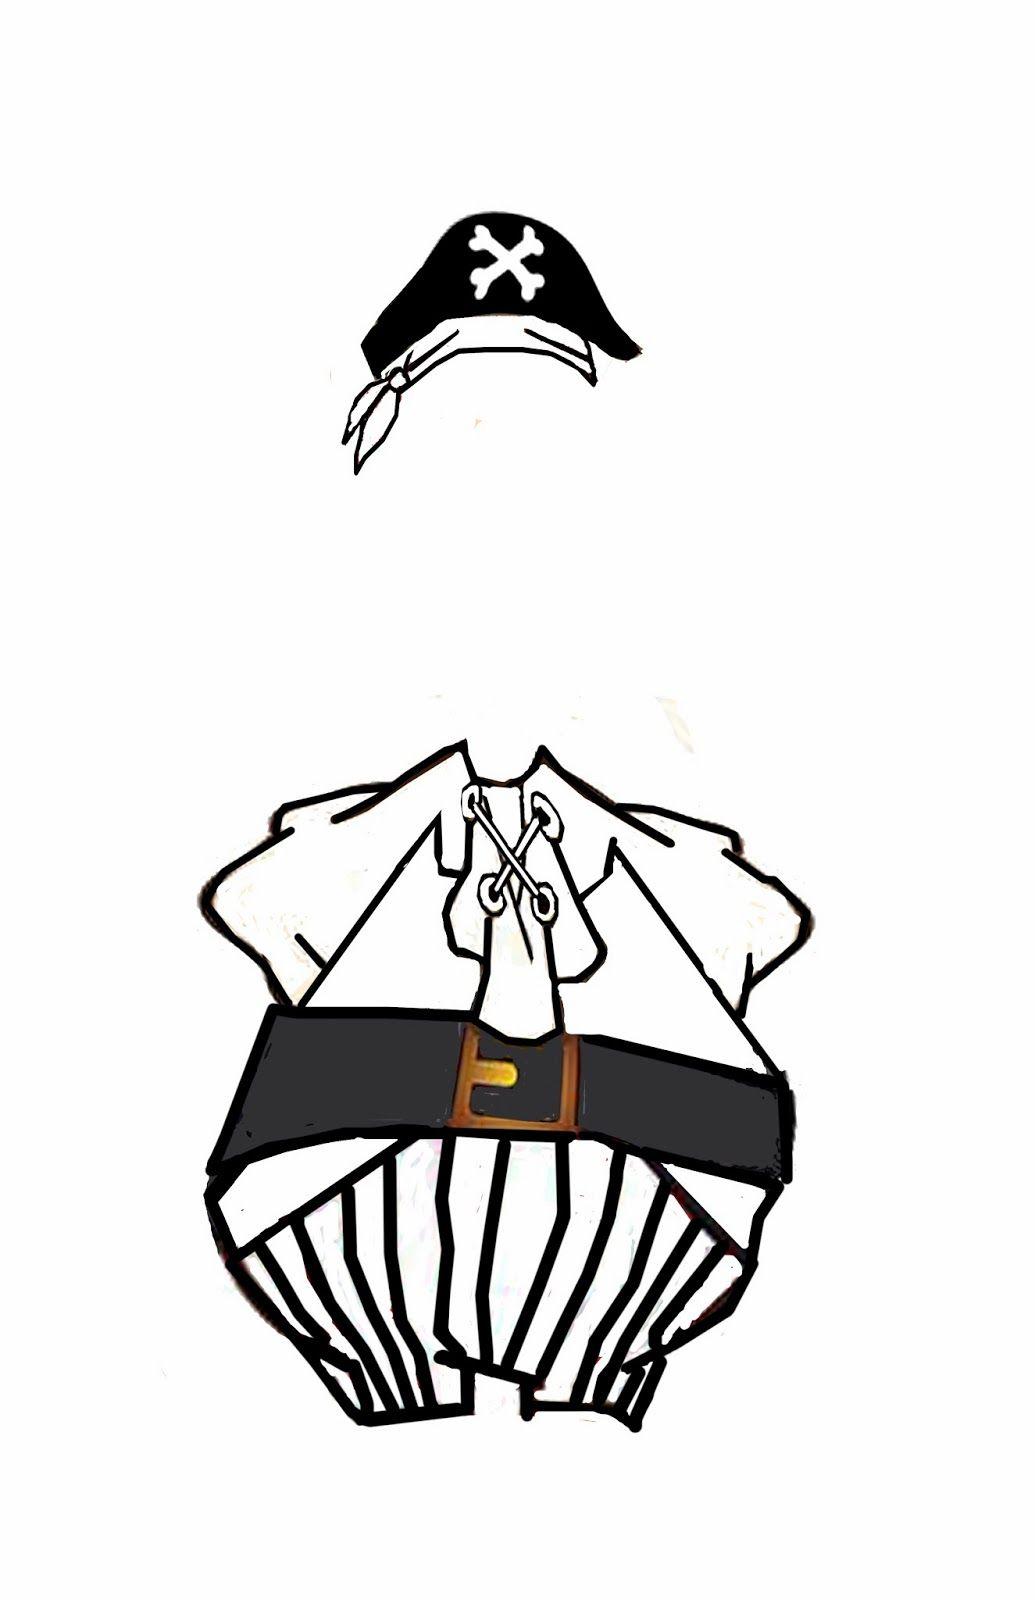 Yesterday I posted my idea for dressing up turkeys. I had.